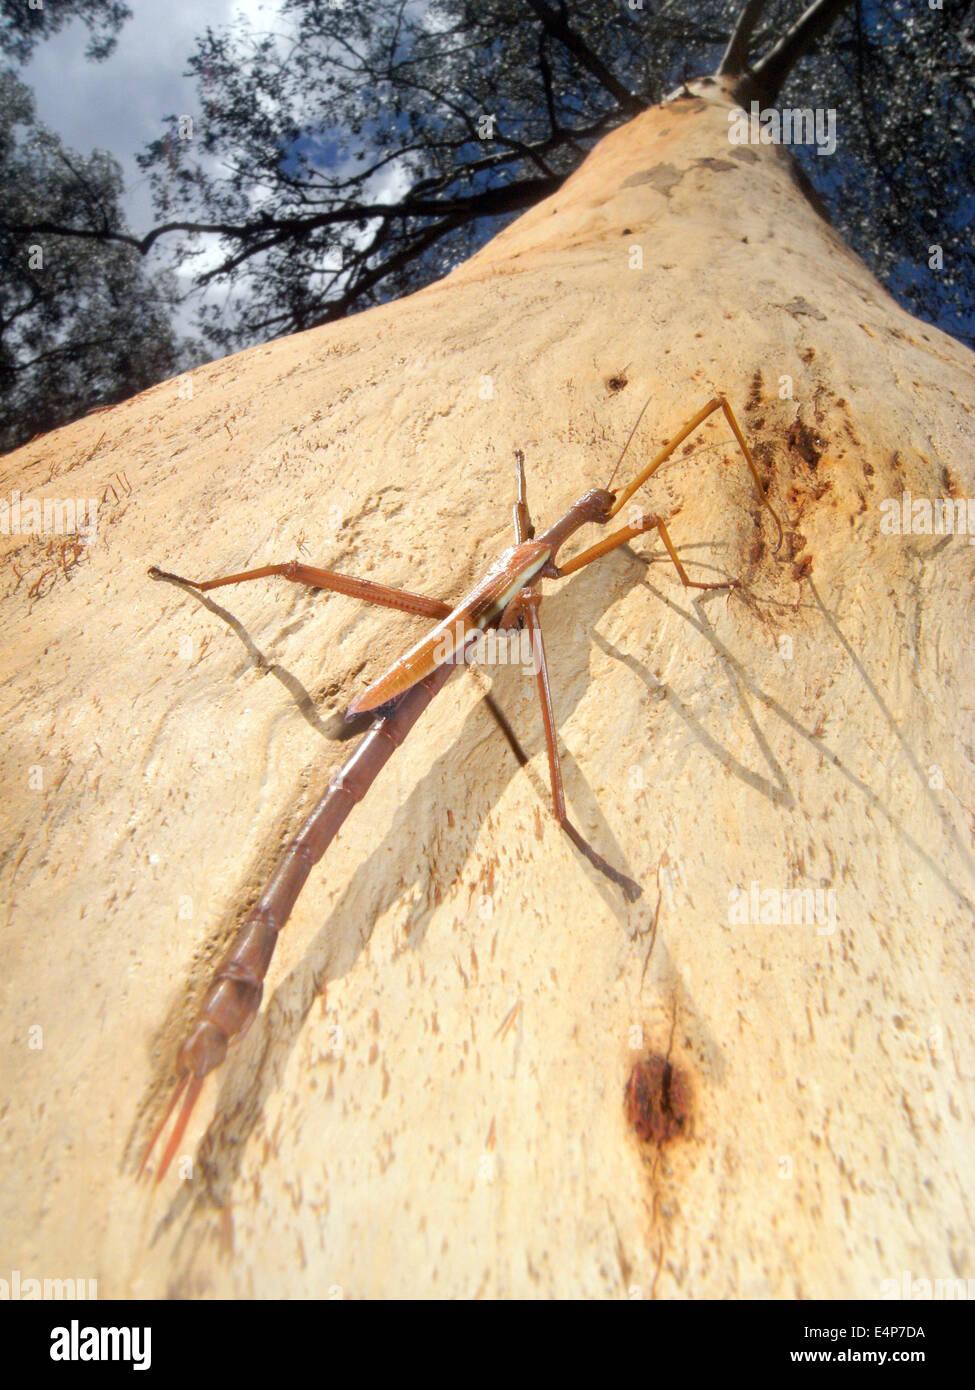 Large stick insect (Ctenomorphodes or Anchiale) on mountain ash tree, Australian Alps, Kosciuzsko National Park, - Stock Image